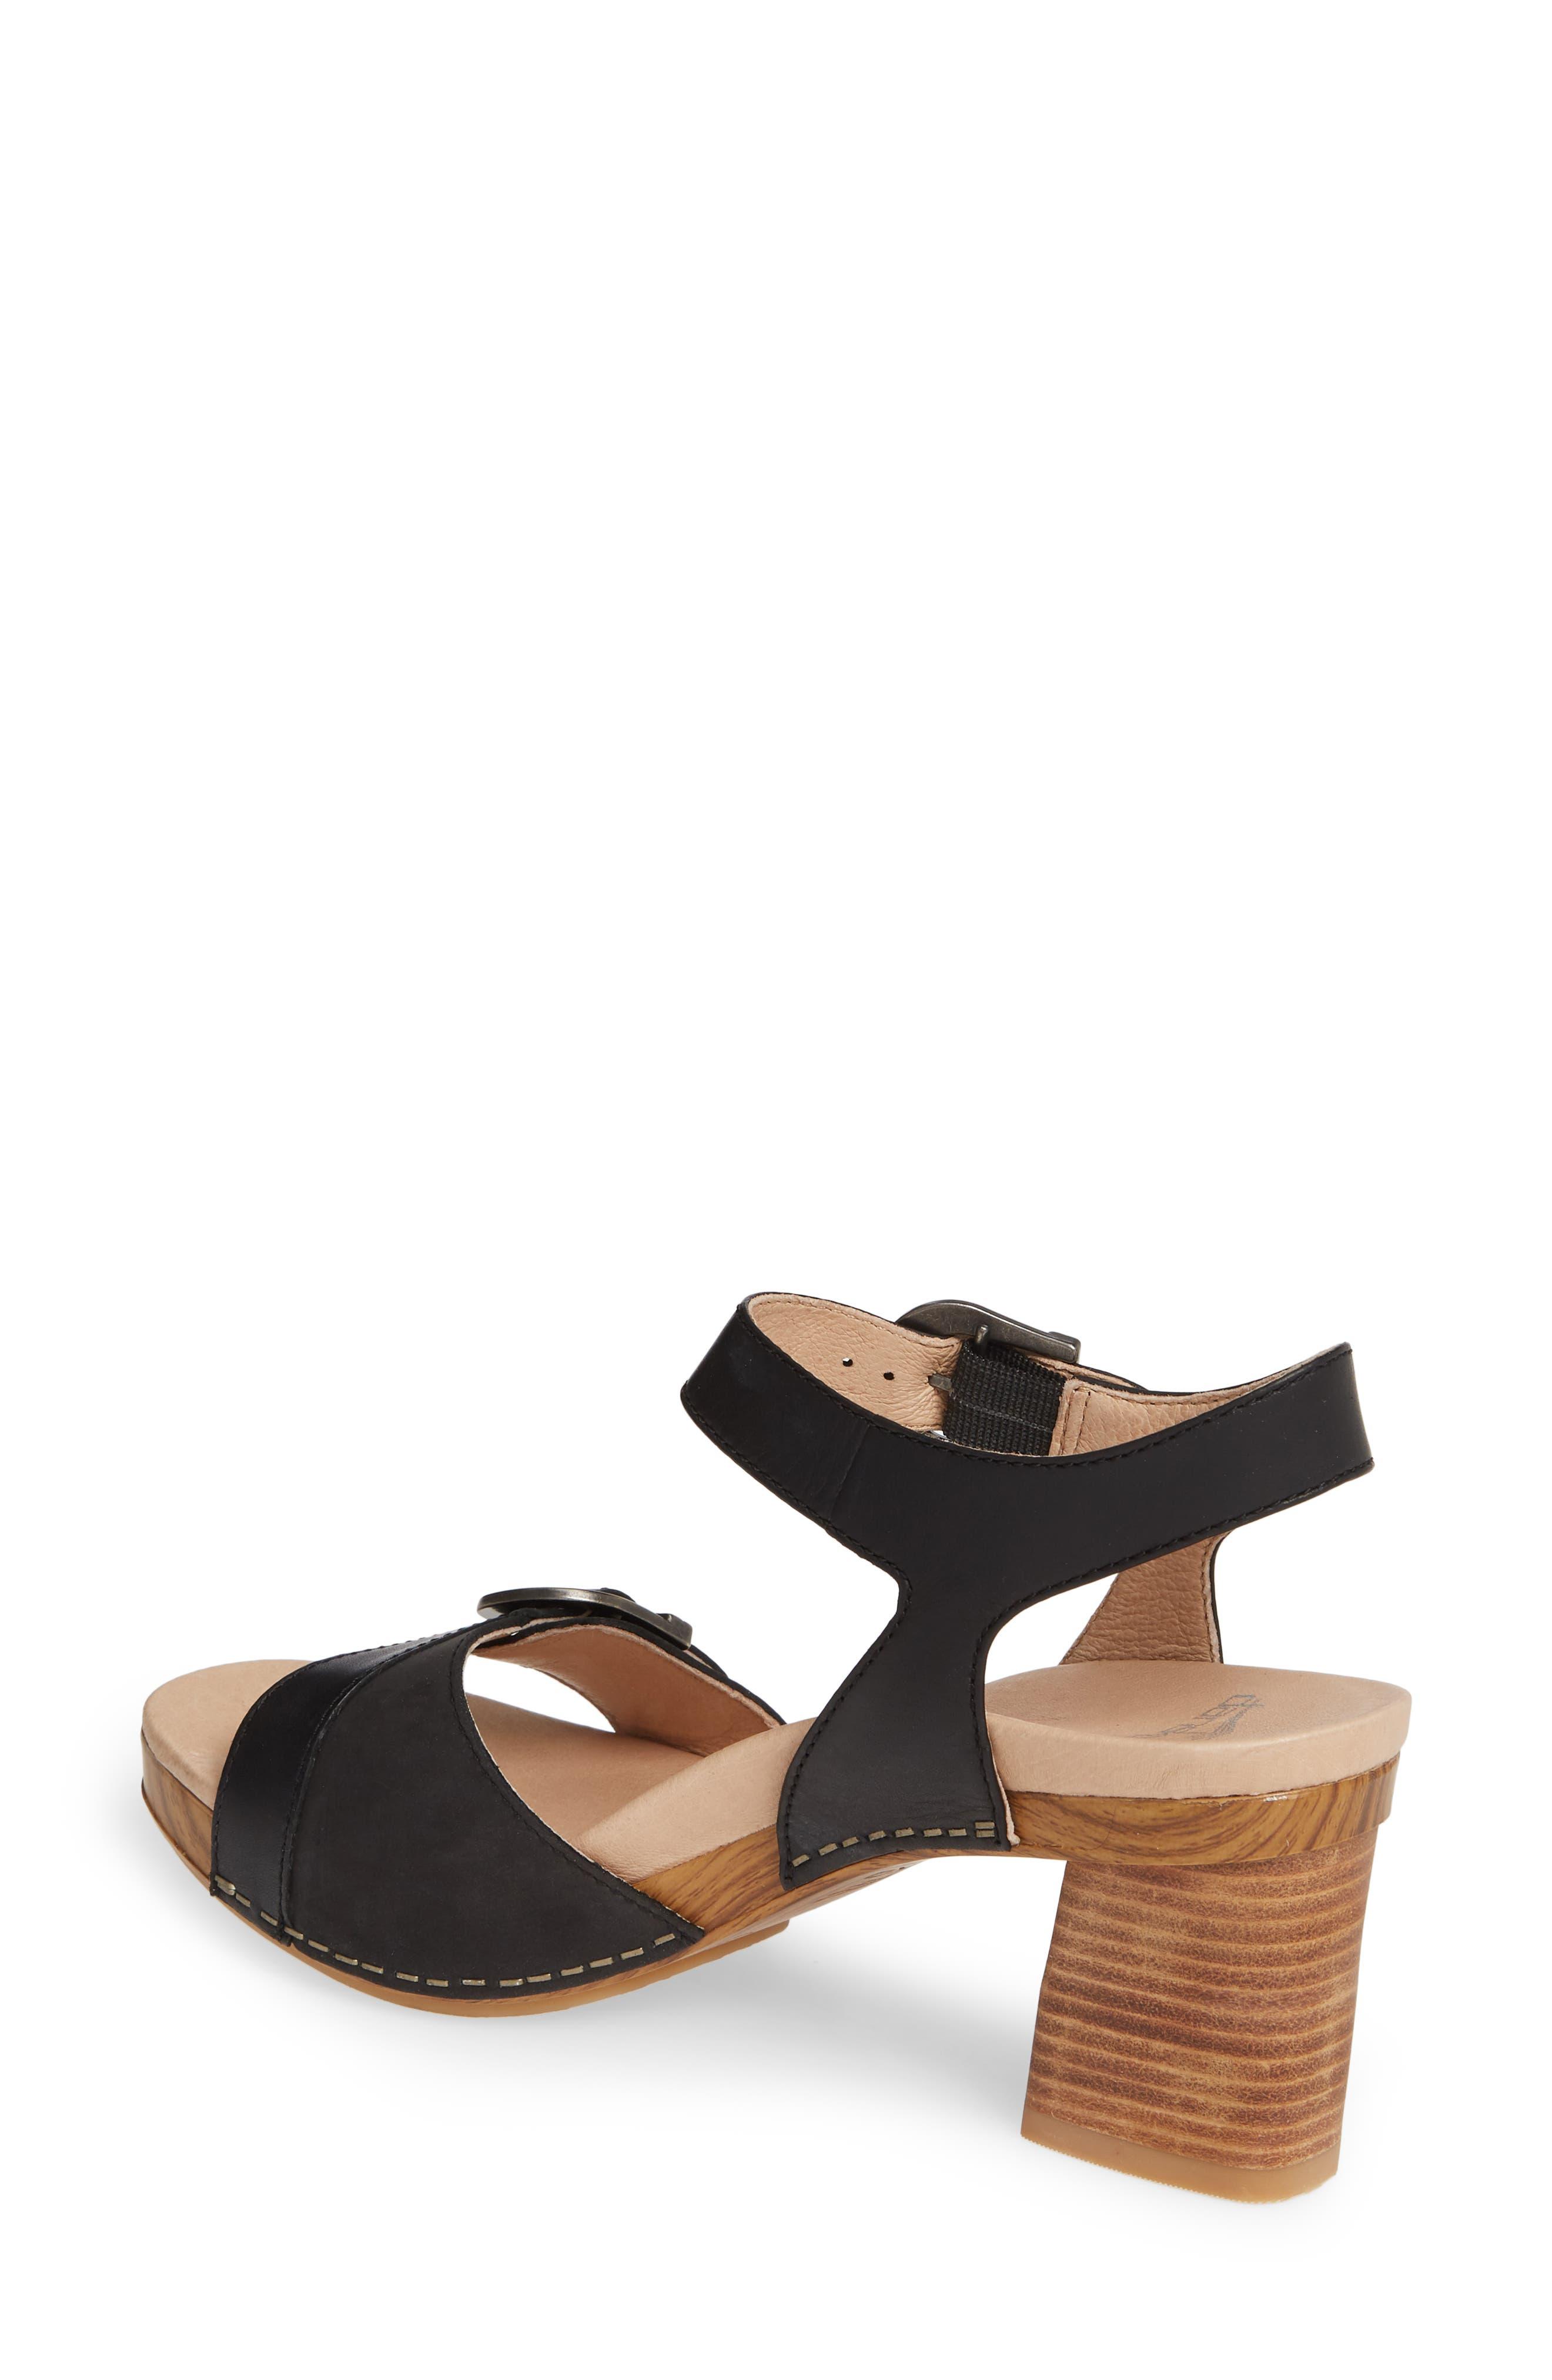 Anna Block Heel Sandal,                             Alternate thumbnail 2, color,                             BLACK LEATHER